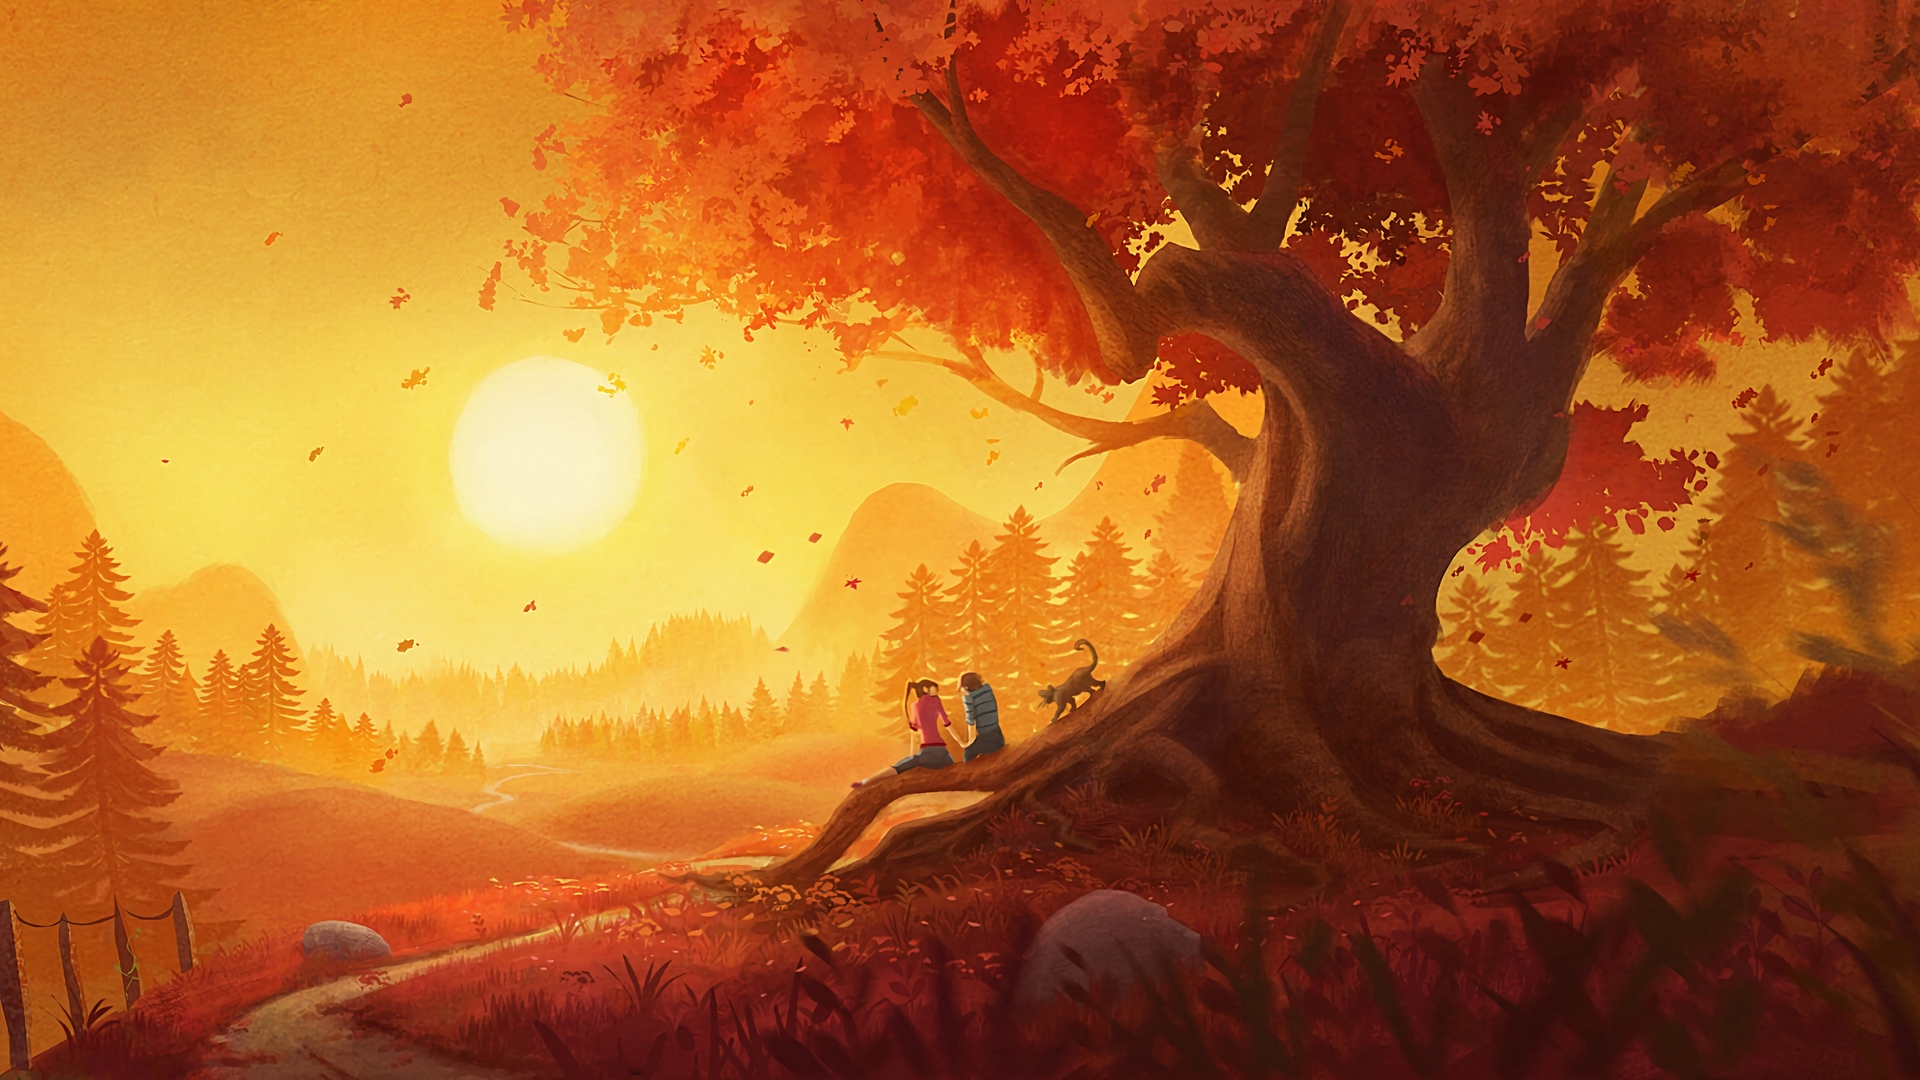 38-389303_wallpaper-pair-sunset-landscap